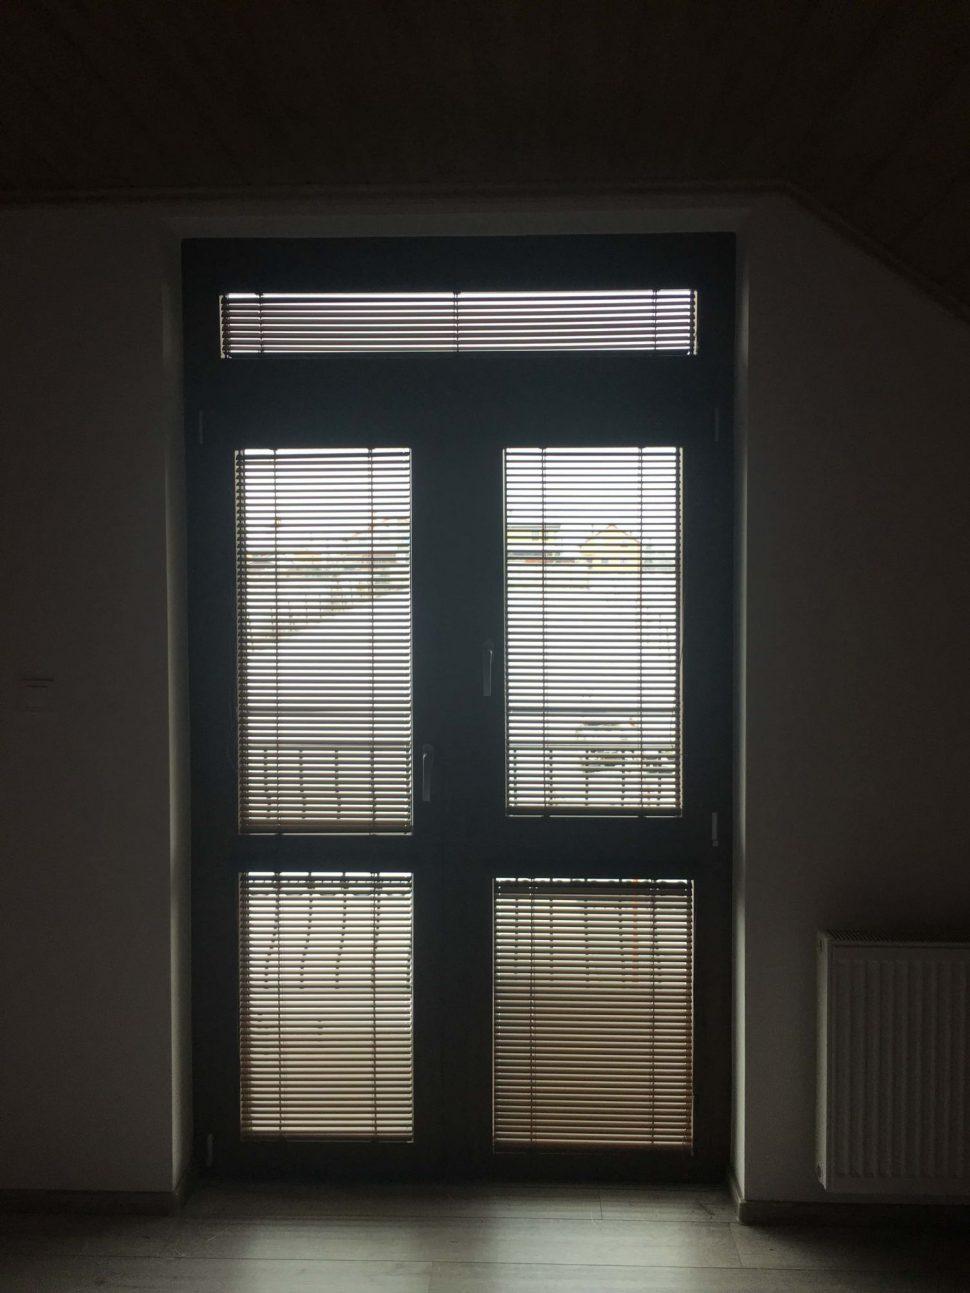 vnutorne-horizontalne-zaluzie-na-okna